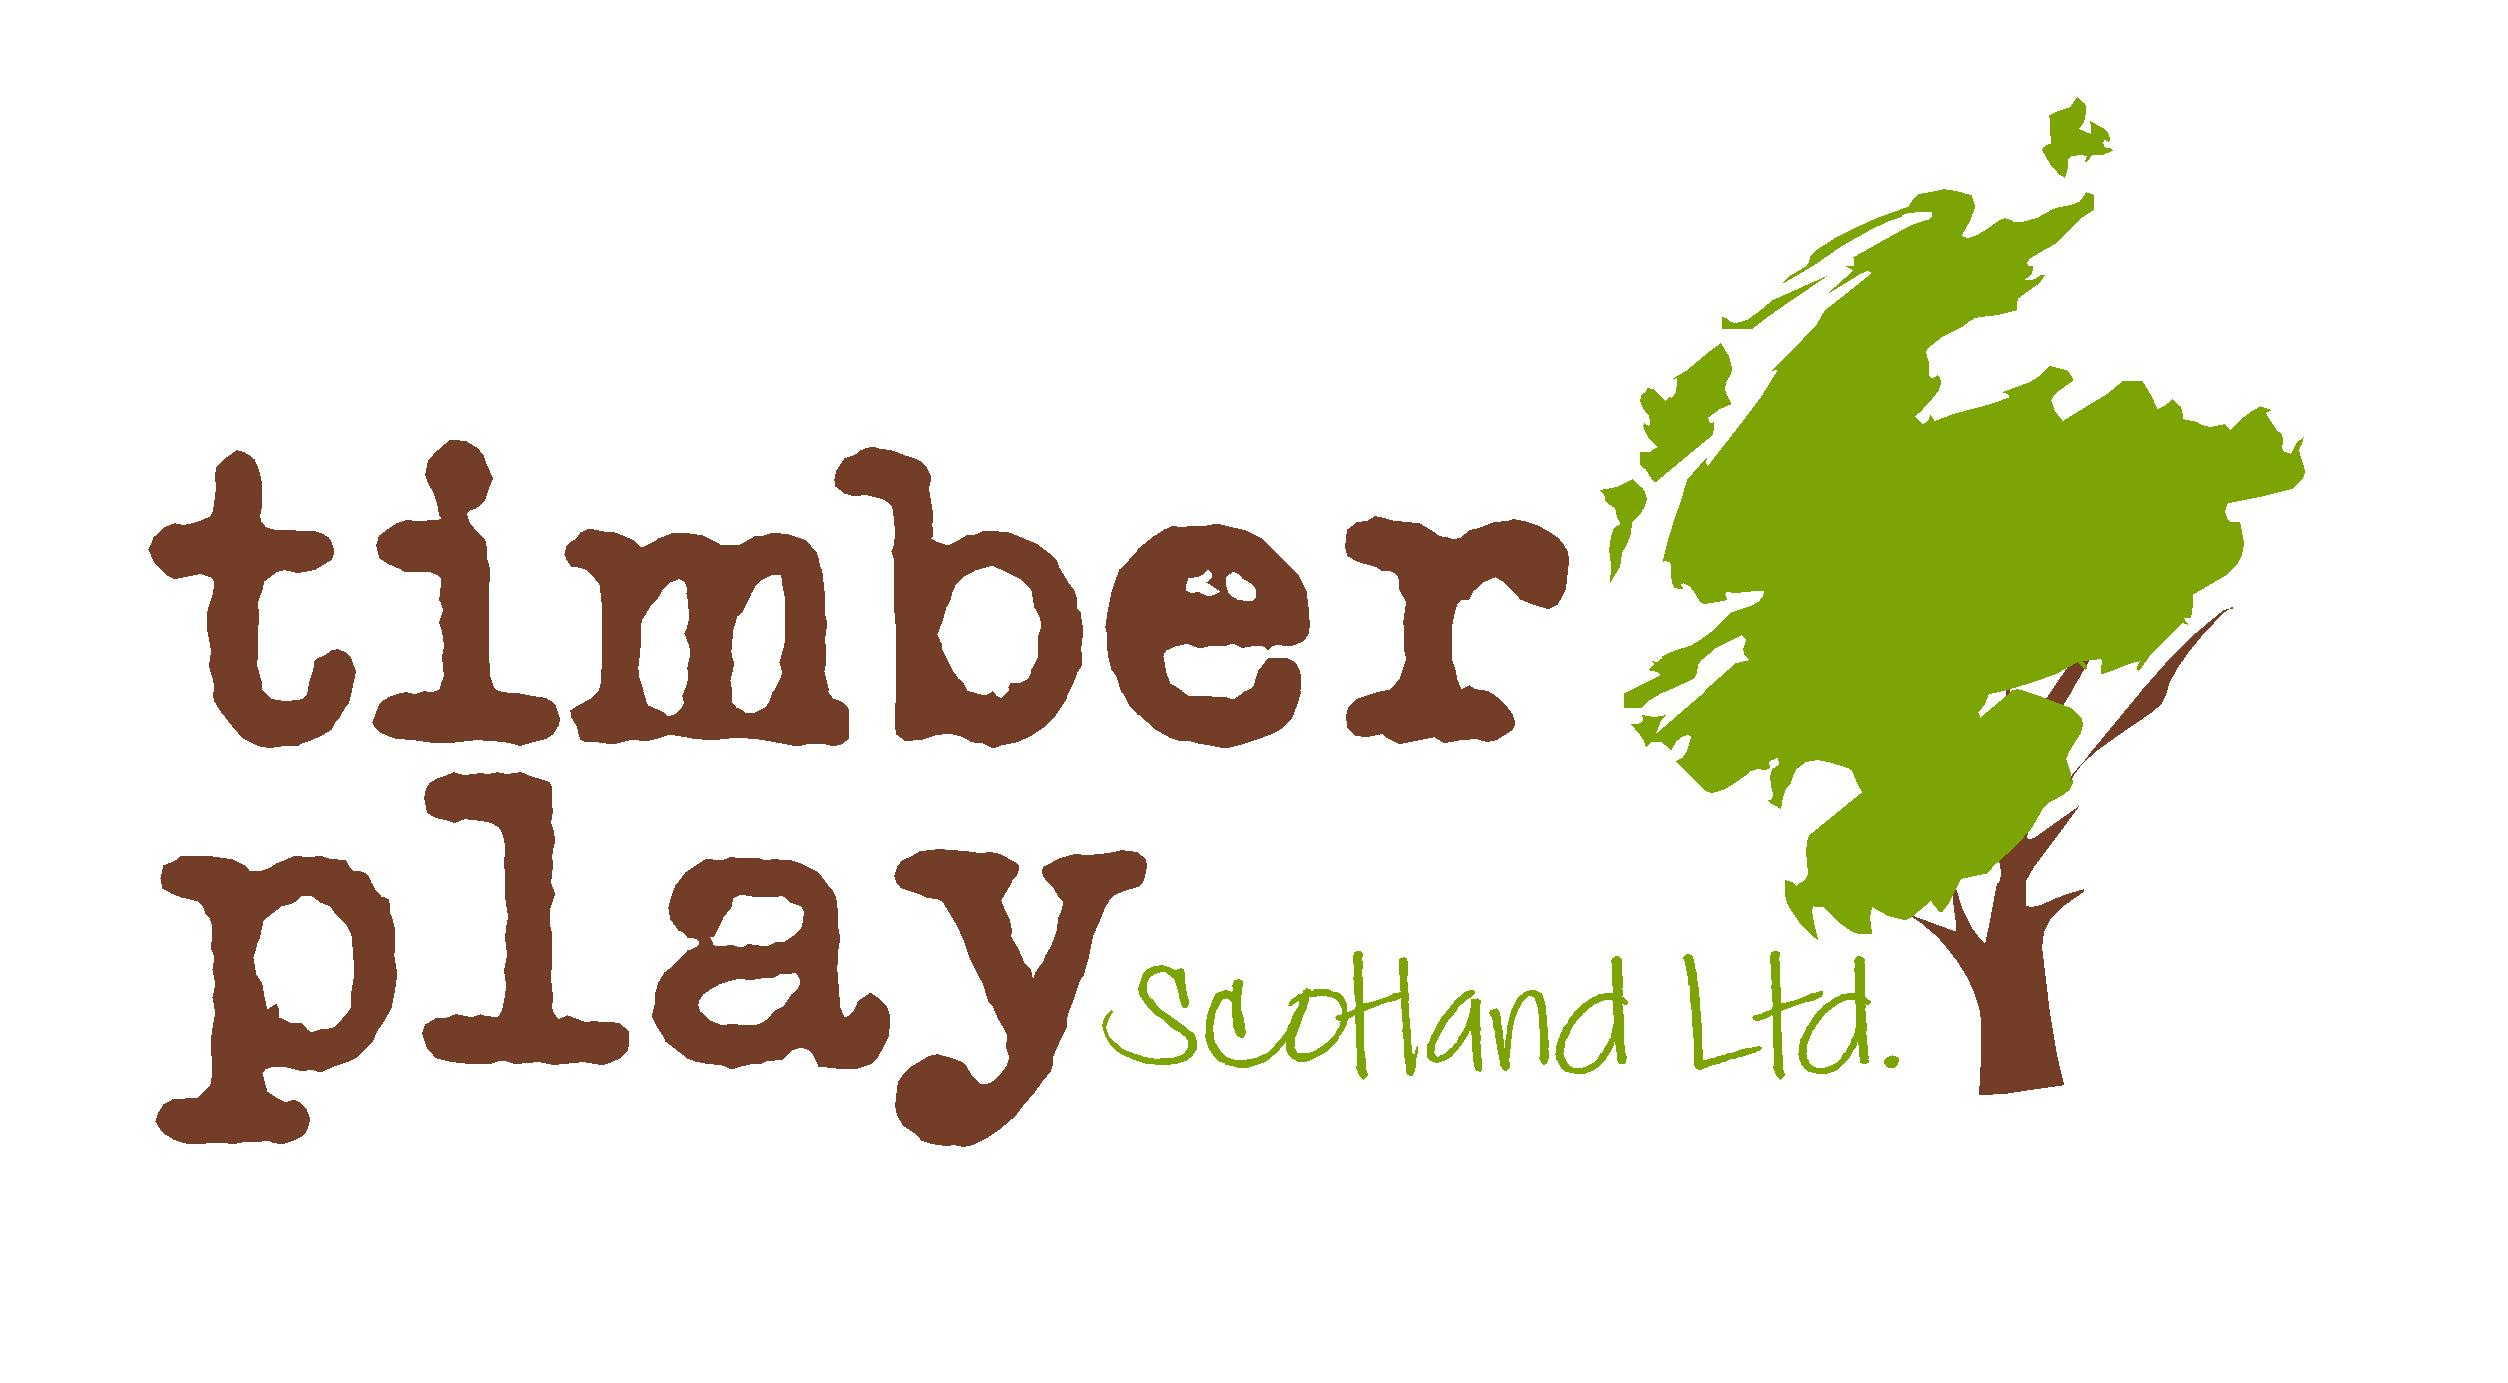 Image showing Timberplay Scotland